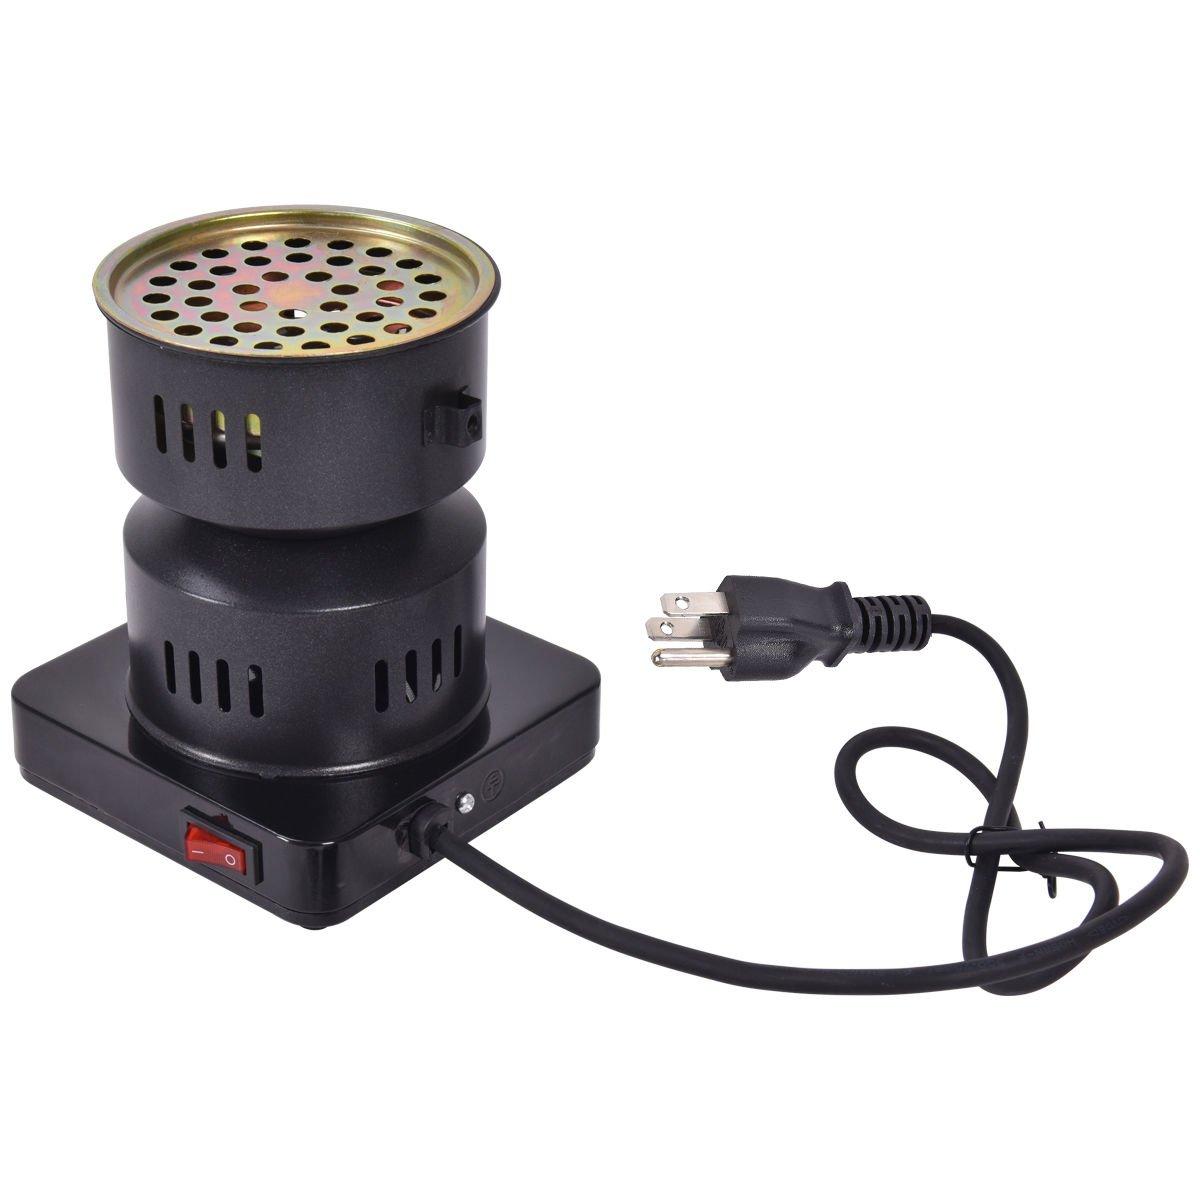 Giantex Electric Coal Starter Hookah Shisha Nargila Heater Stove Charcoal Burner BBQ